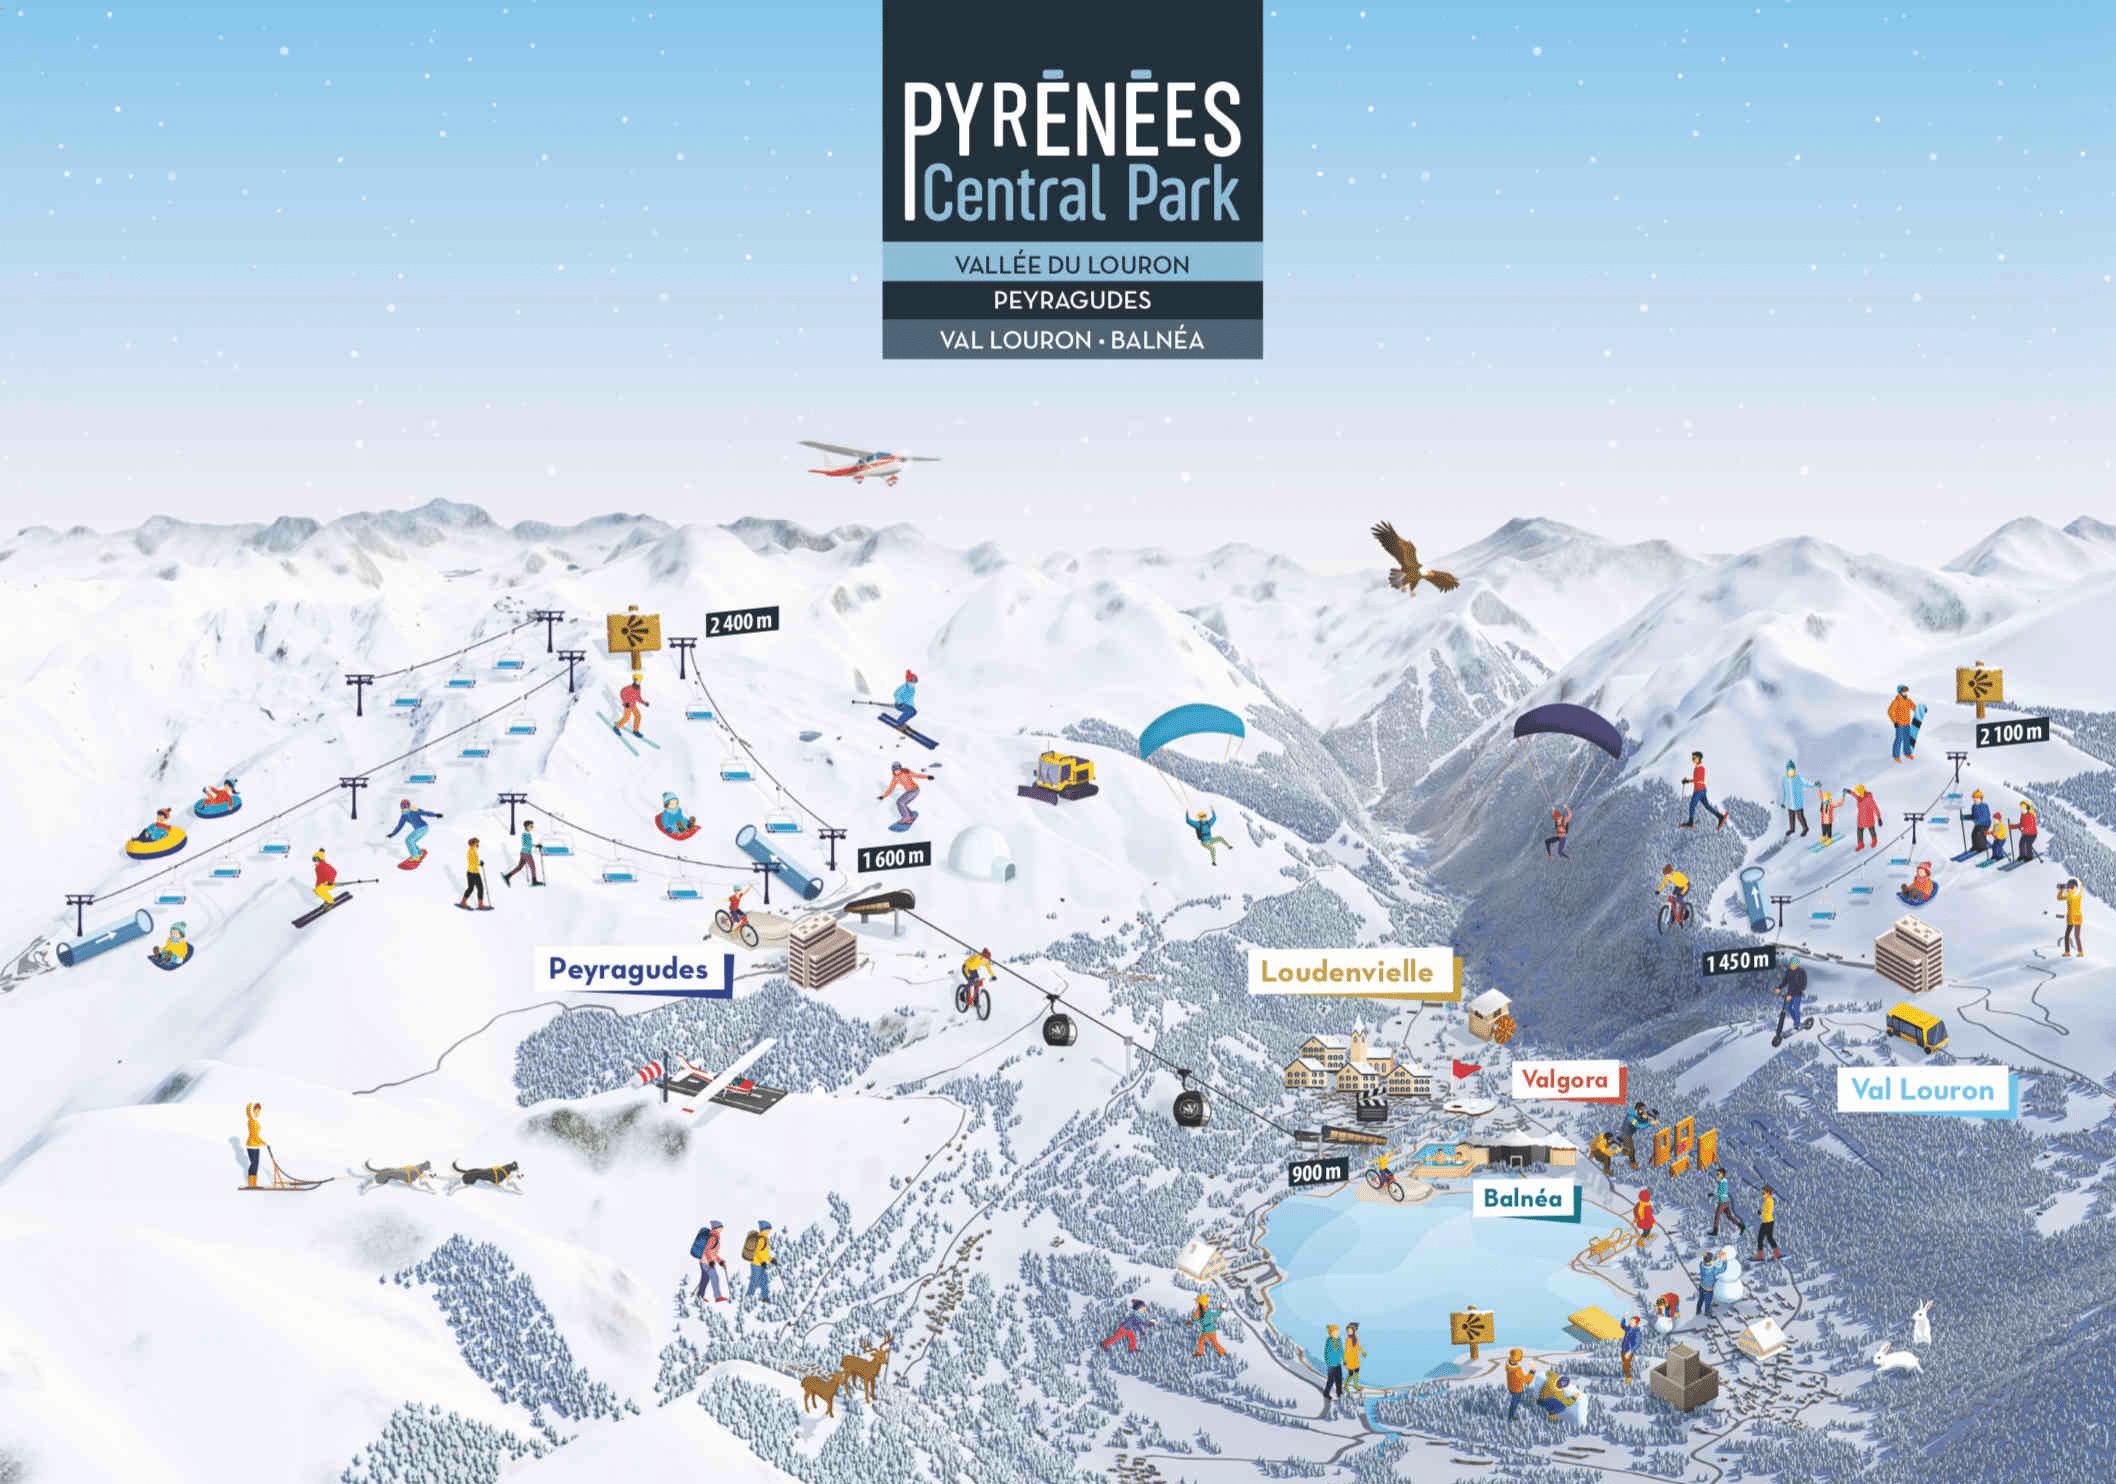 Peyragudes - Plan de la vallée en hiver